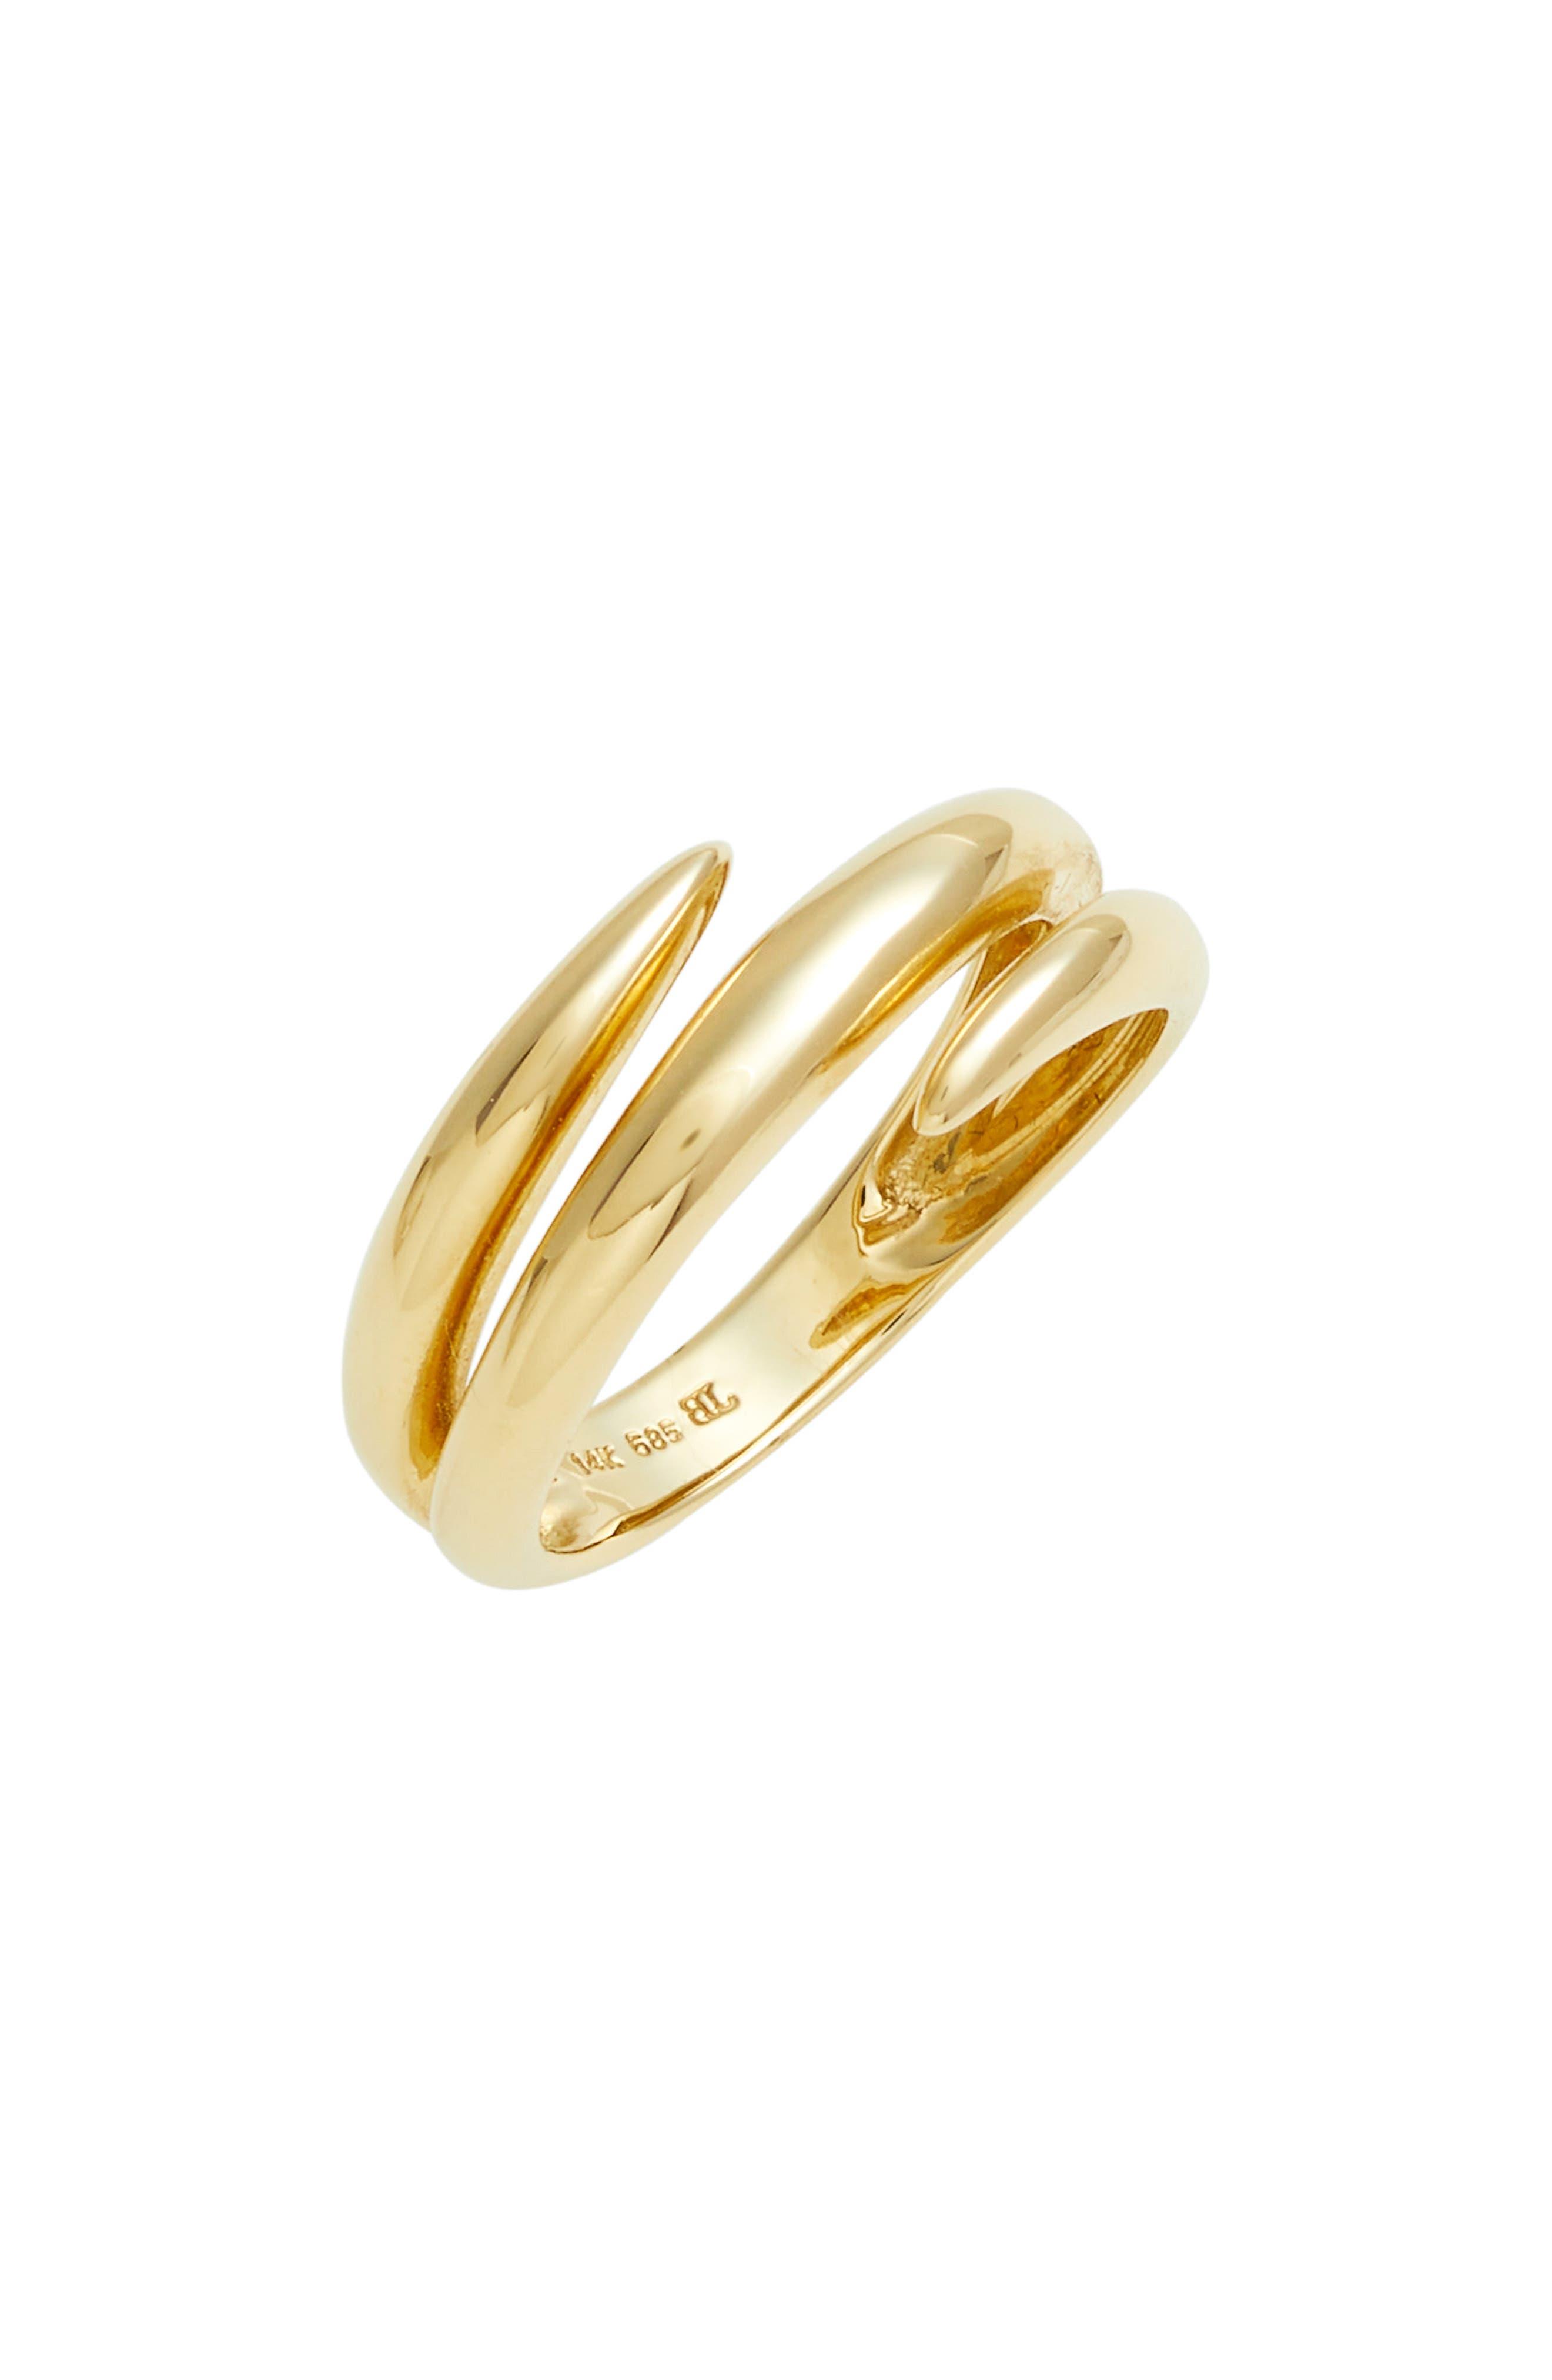 Ofira 14K Gold Coil Wrap Ring,                             Main thumbnail 1, color,                             YELLOW GOLD